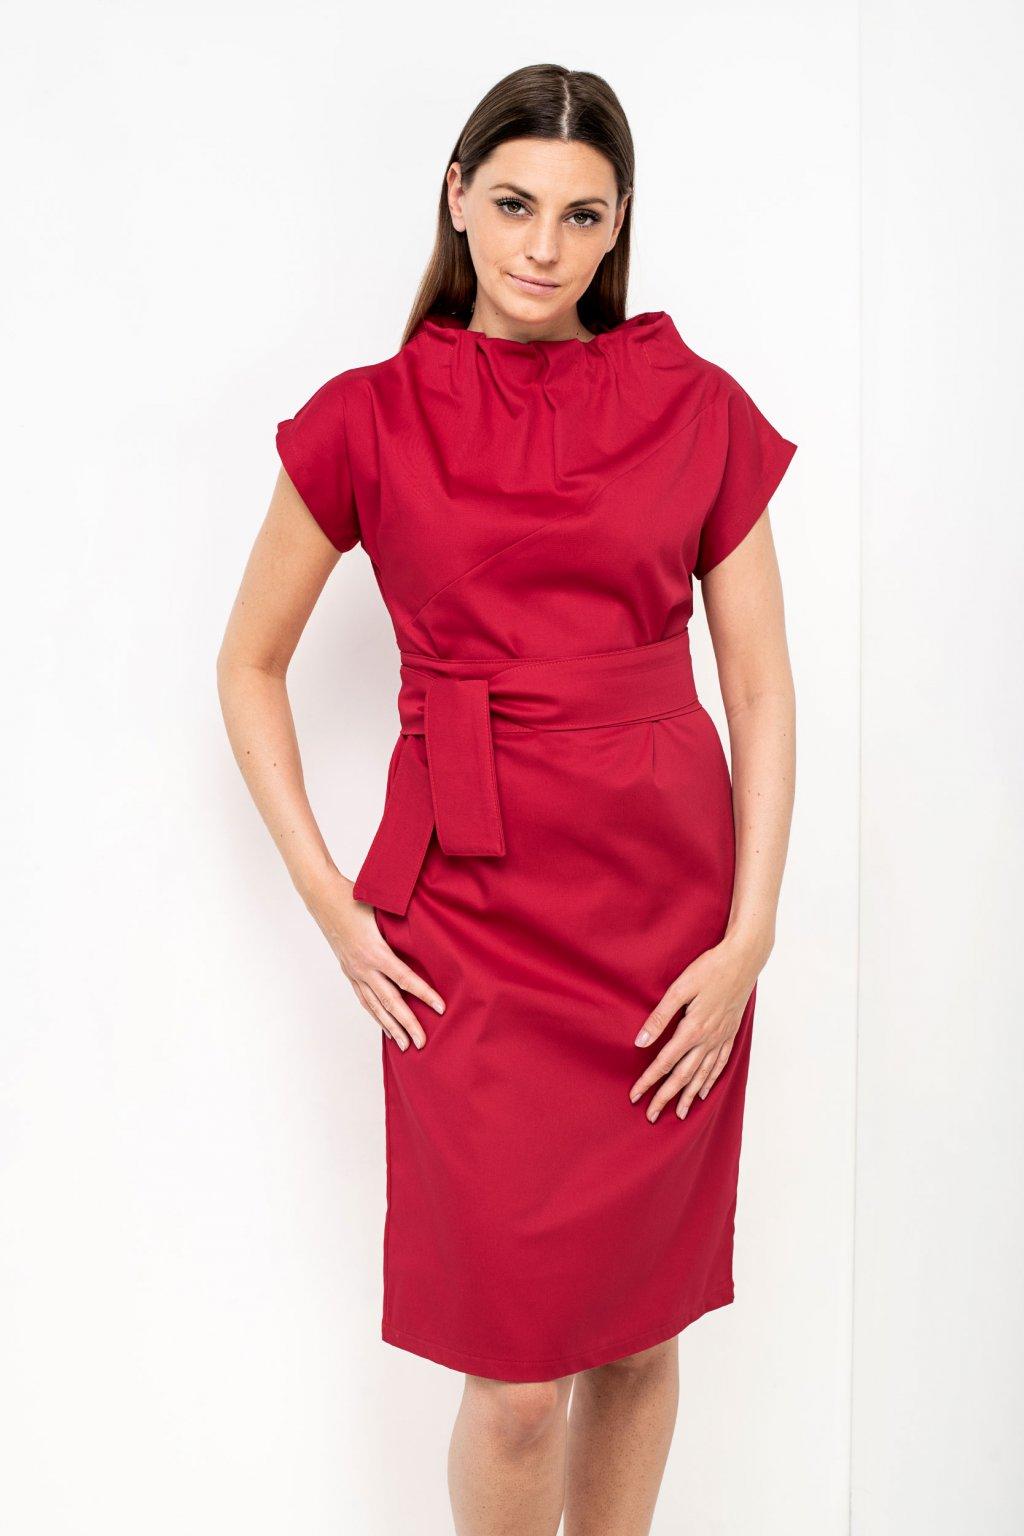 ZIK Šaty s nariaseným rolákovým výstrihom červené (3)